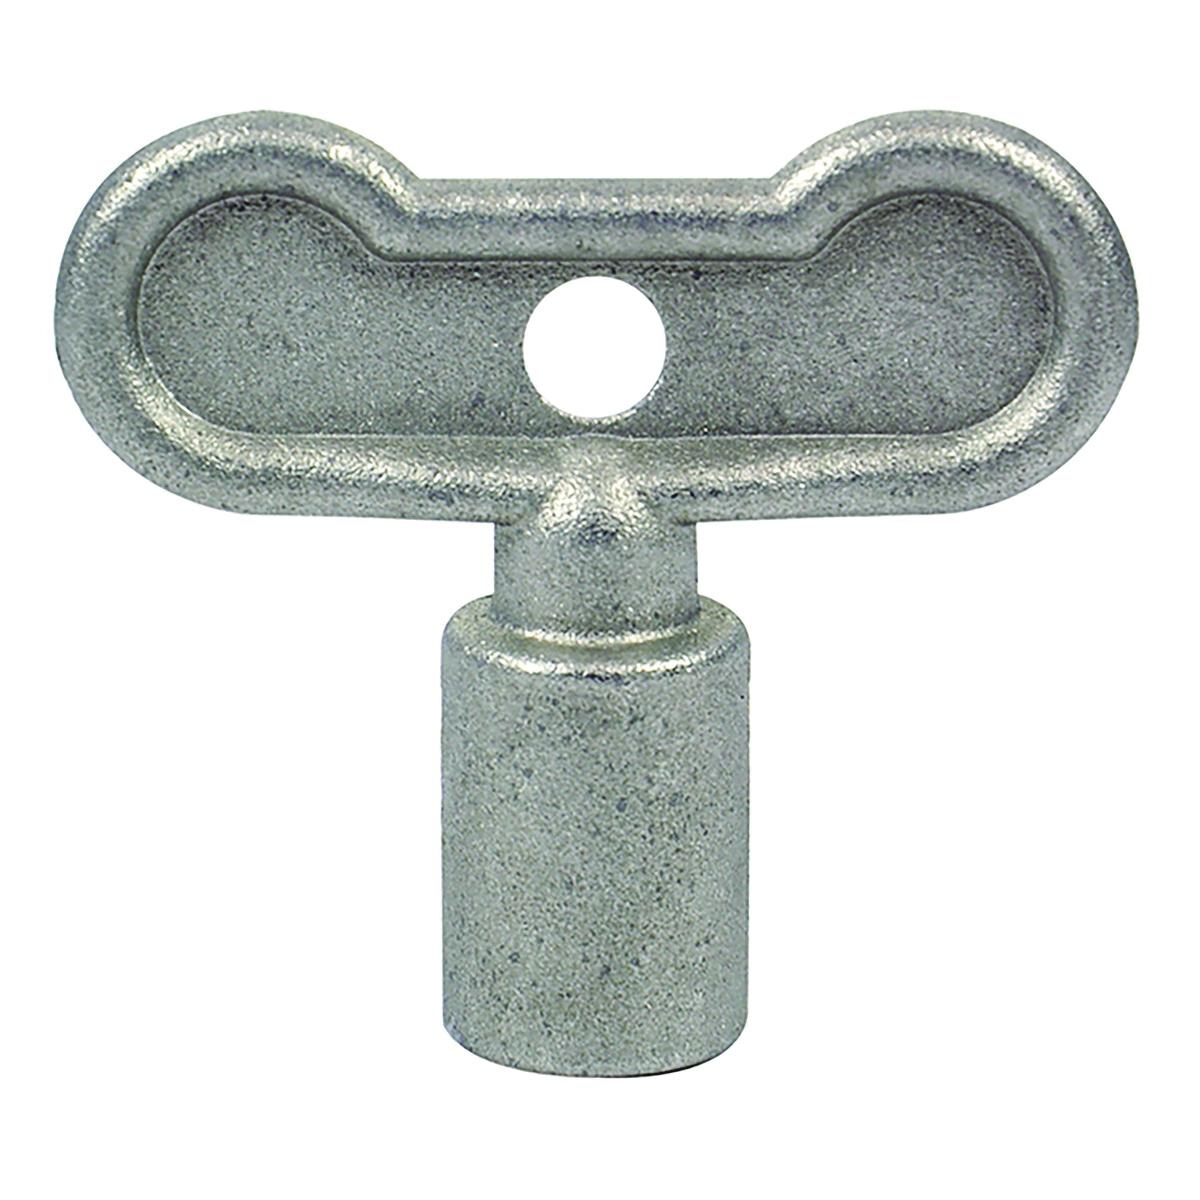 Picture of Danco 80132 Sillcock Key, Metal